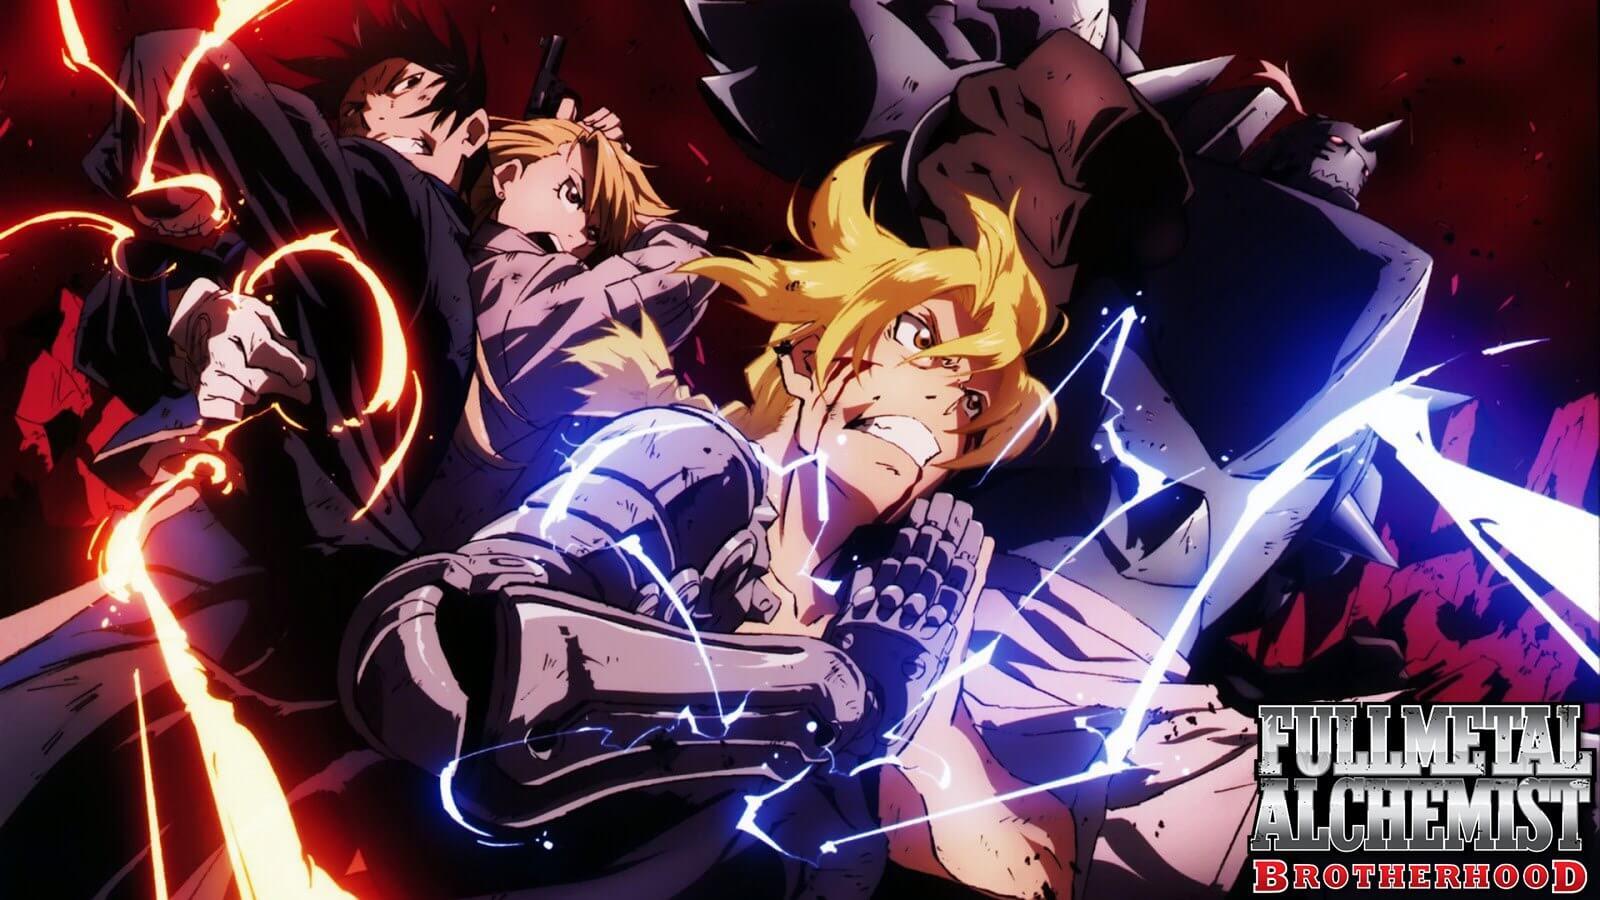 Fullmetal Alchemist Brotherhood Serie Completa Latino Japones 1080hd 720p Mega Utorrent Descargar Animes Por Mega